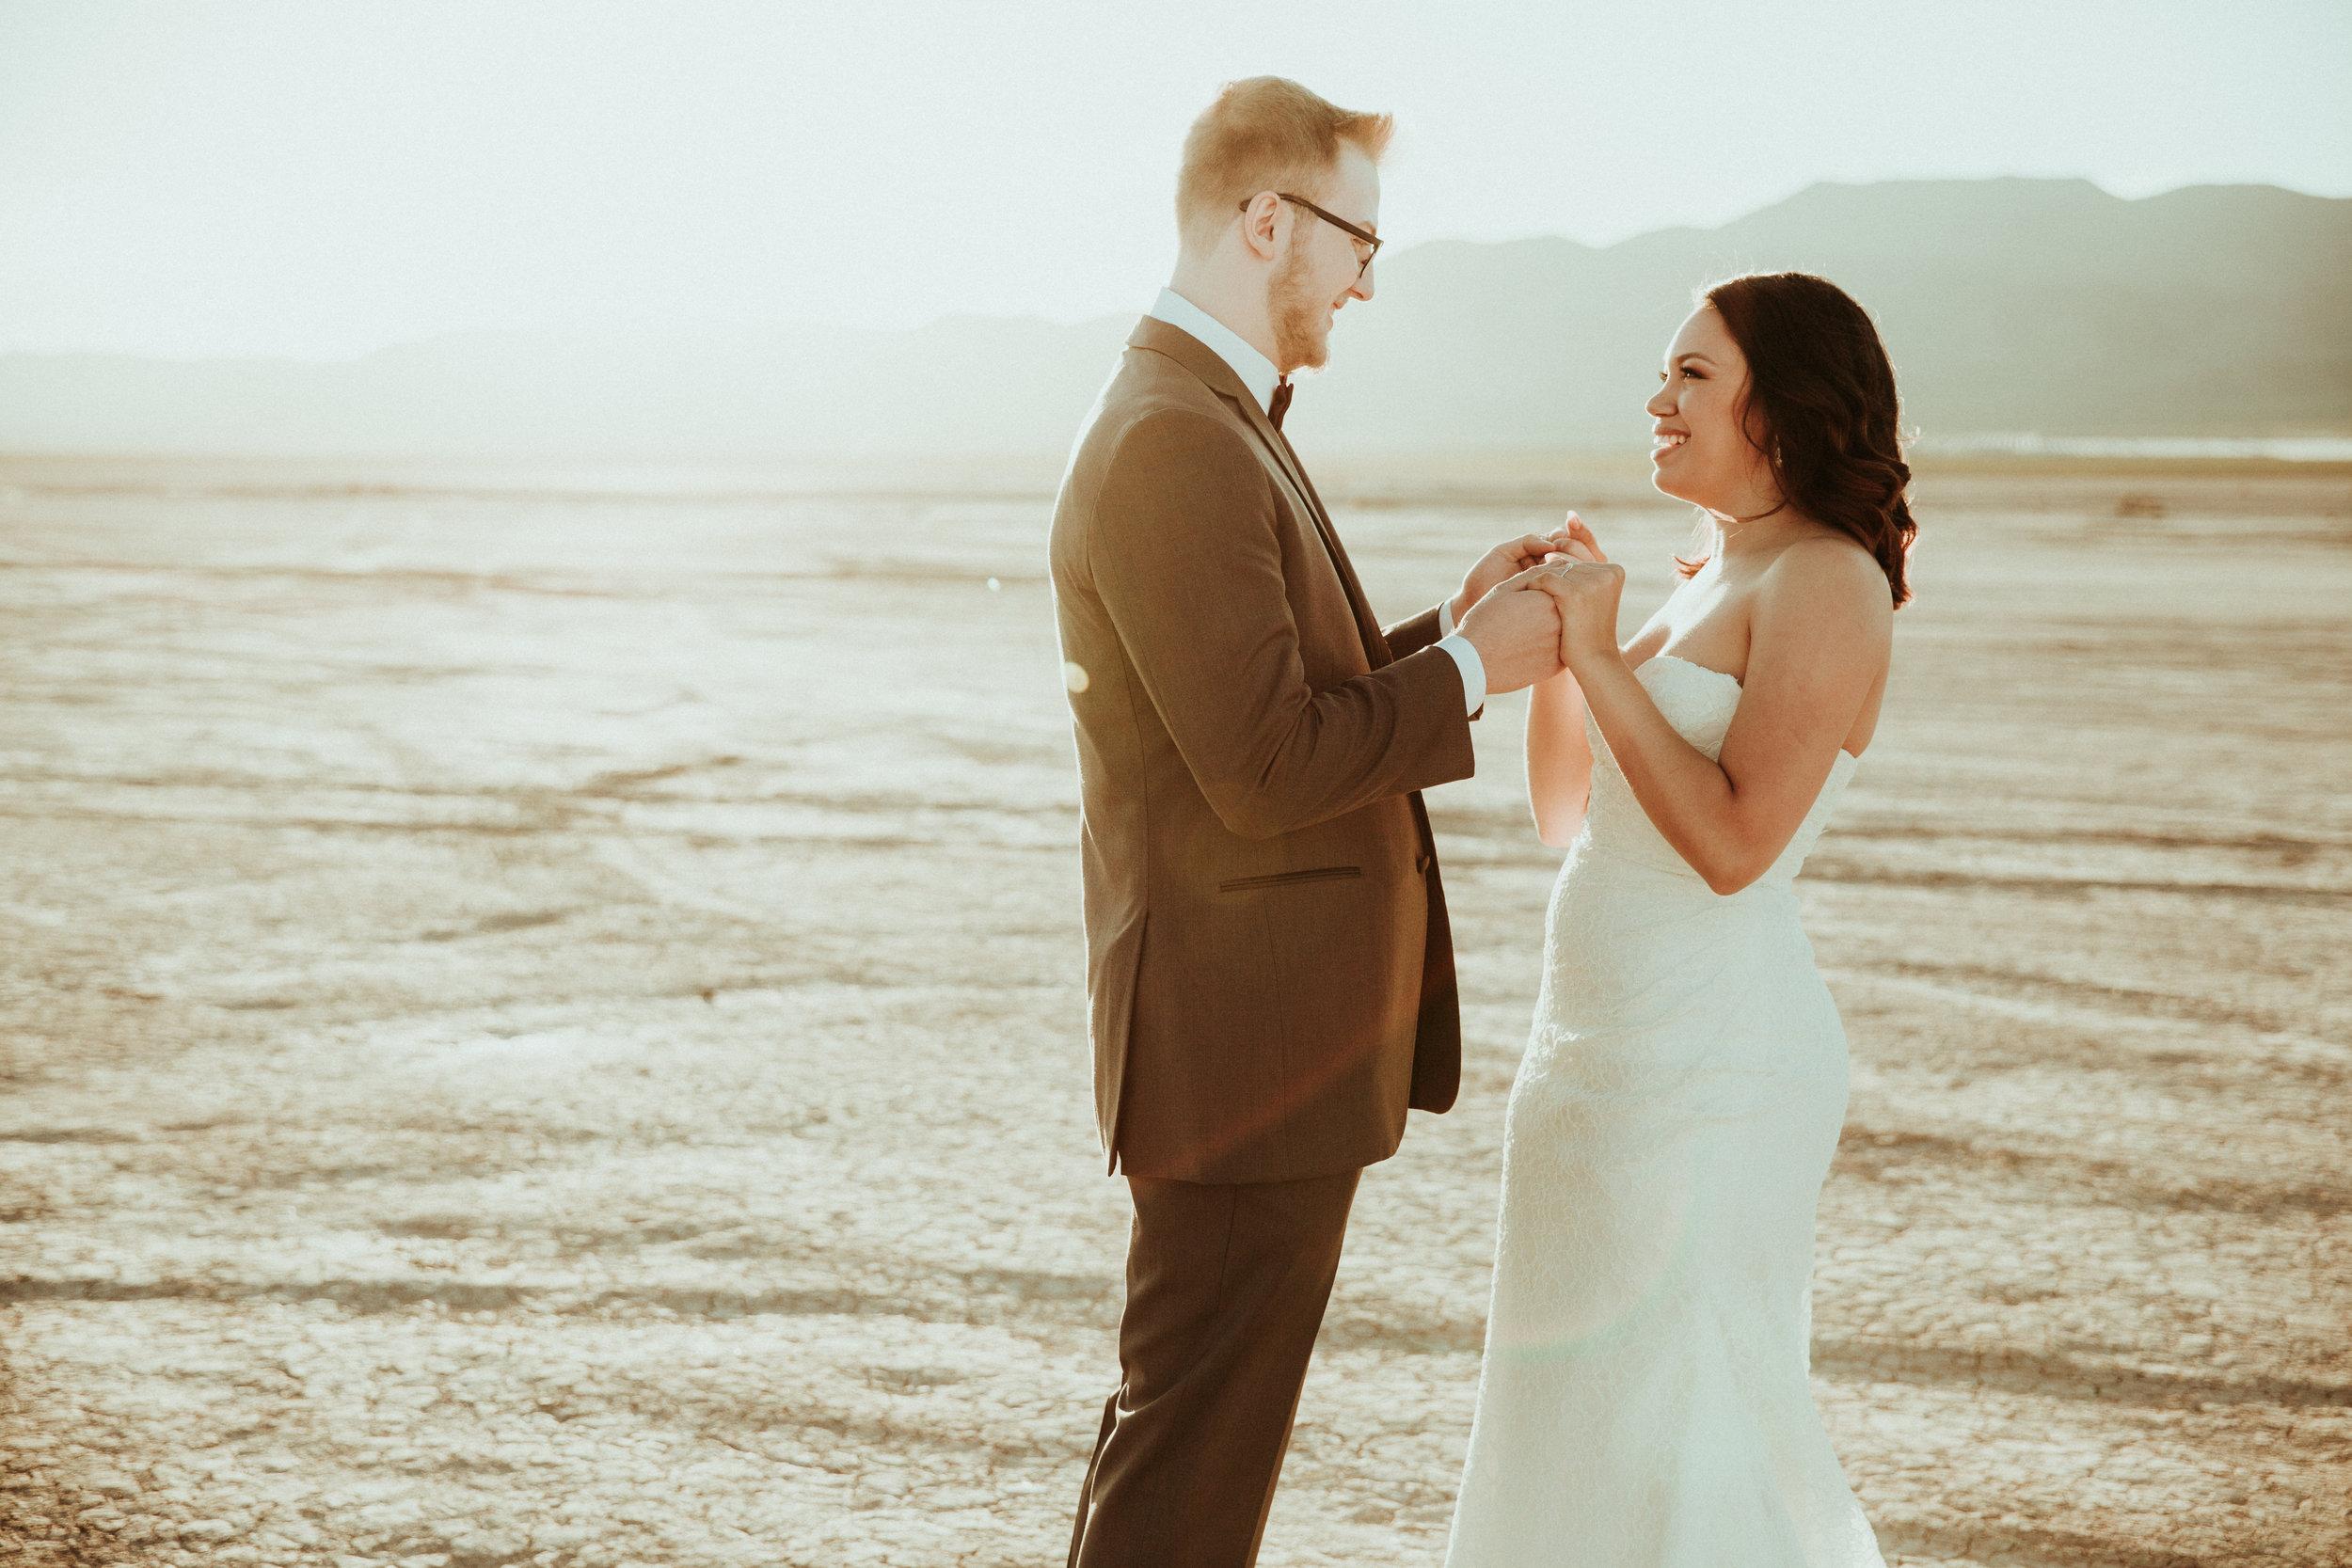 First Look - Jessica + Daniel - Henderson Wedding Photographer - Las Vegas Wedding Photography - Seattle Elopement Photographer